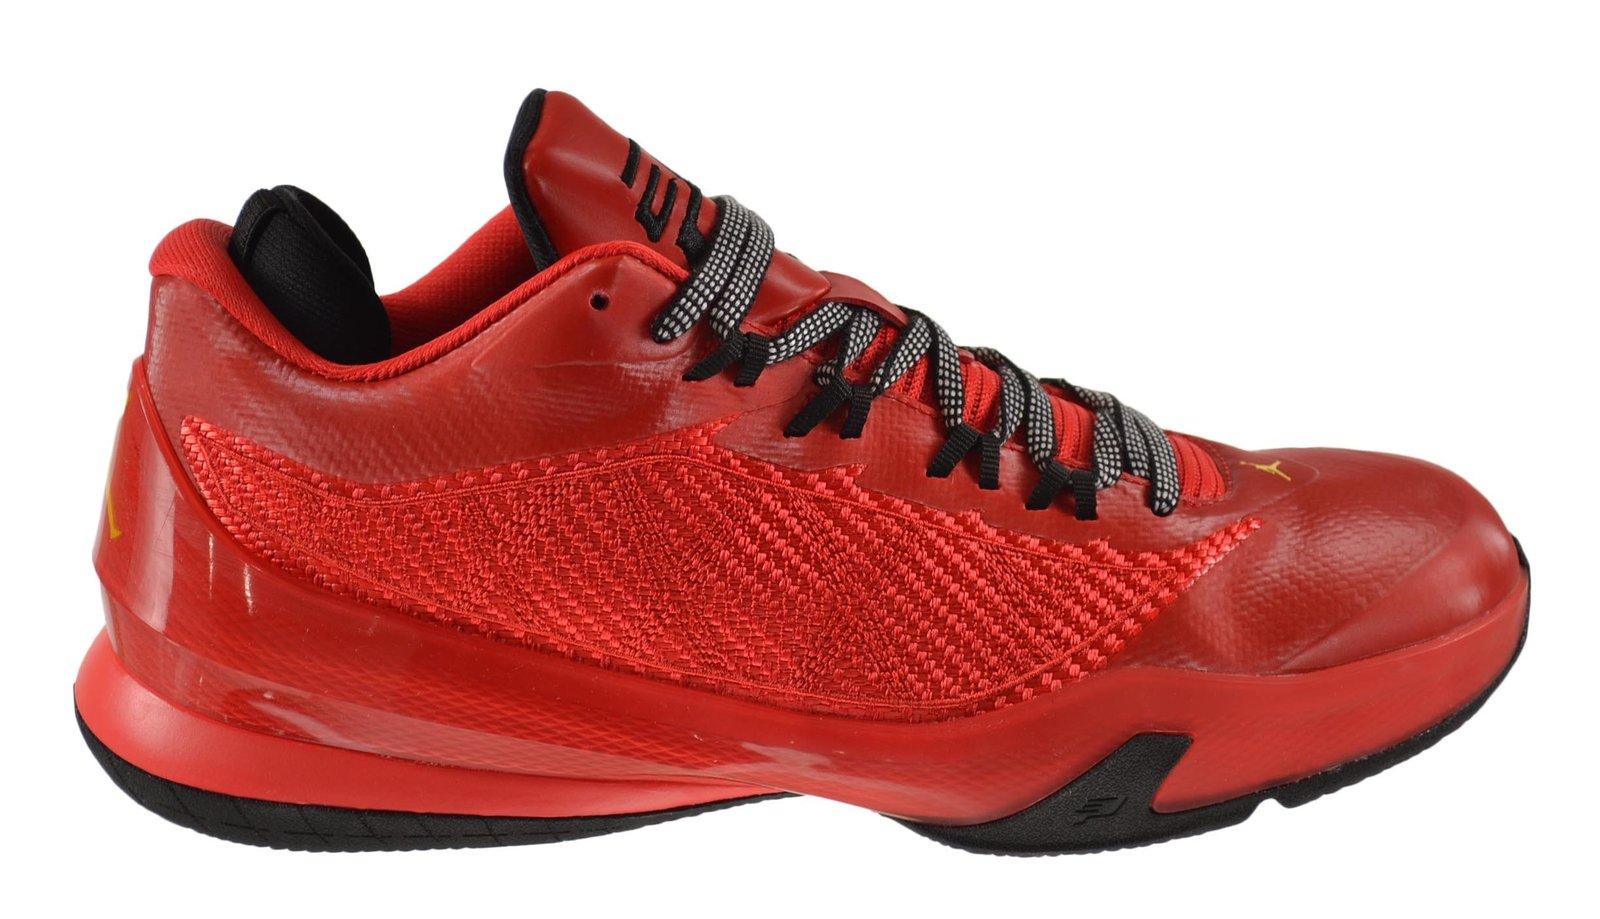 cheap for discount 7abd8 b93fb Jordan CP3.VIII Men s Shoes Challenge Red Tour Yellow-Black 684855-605